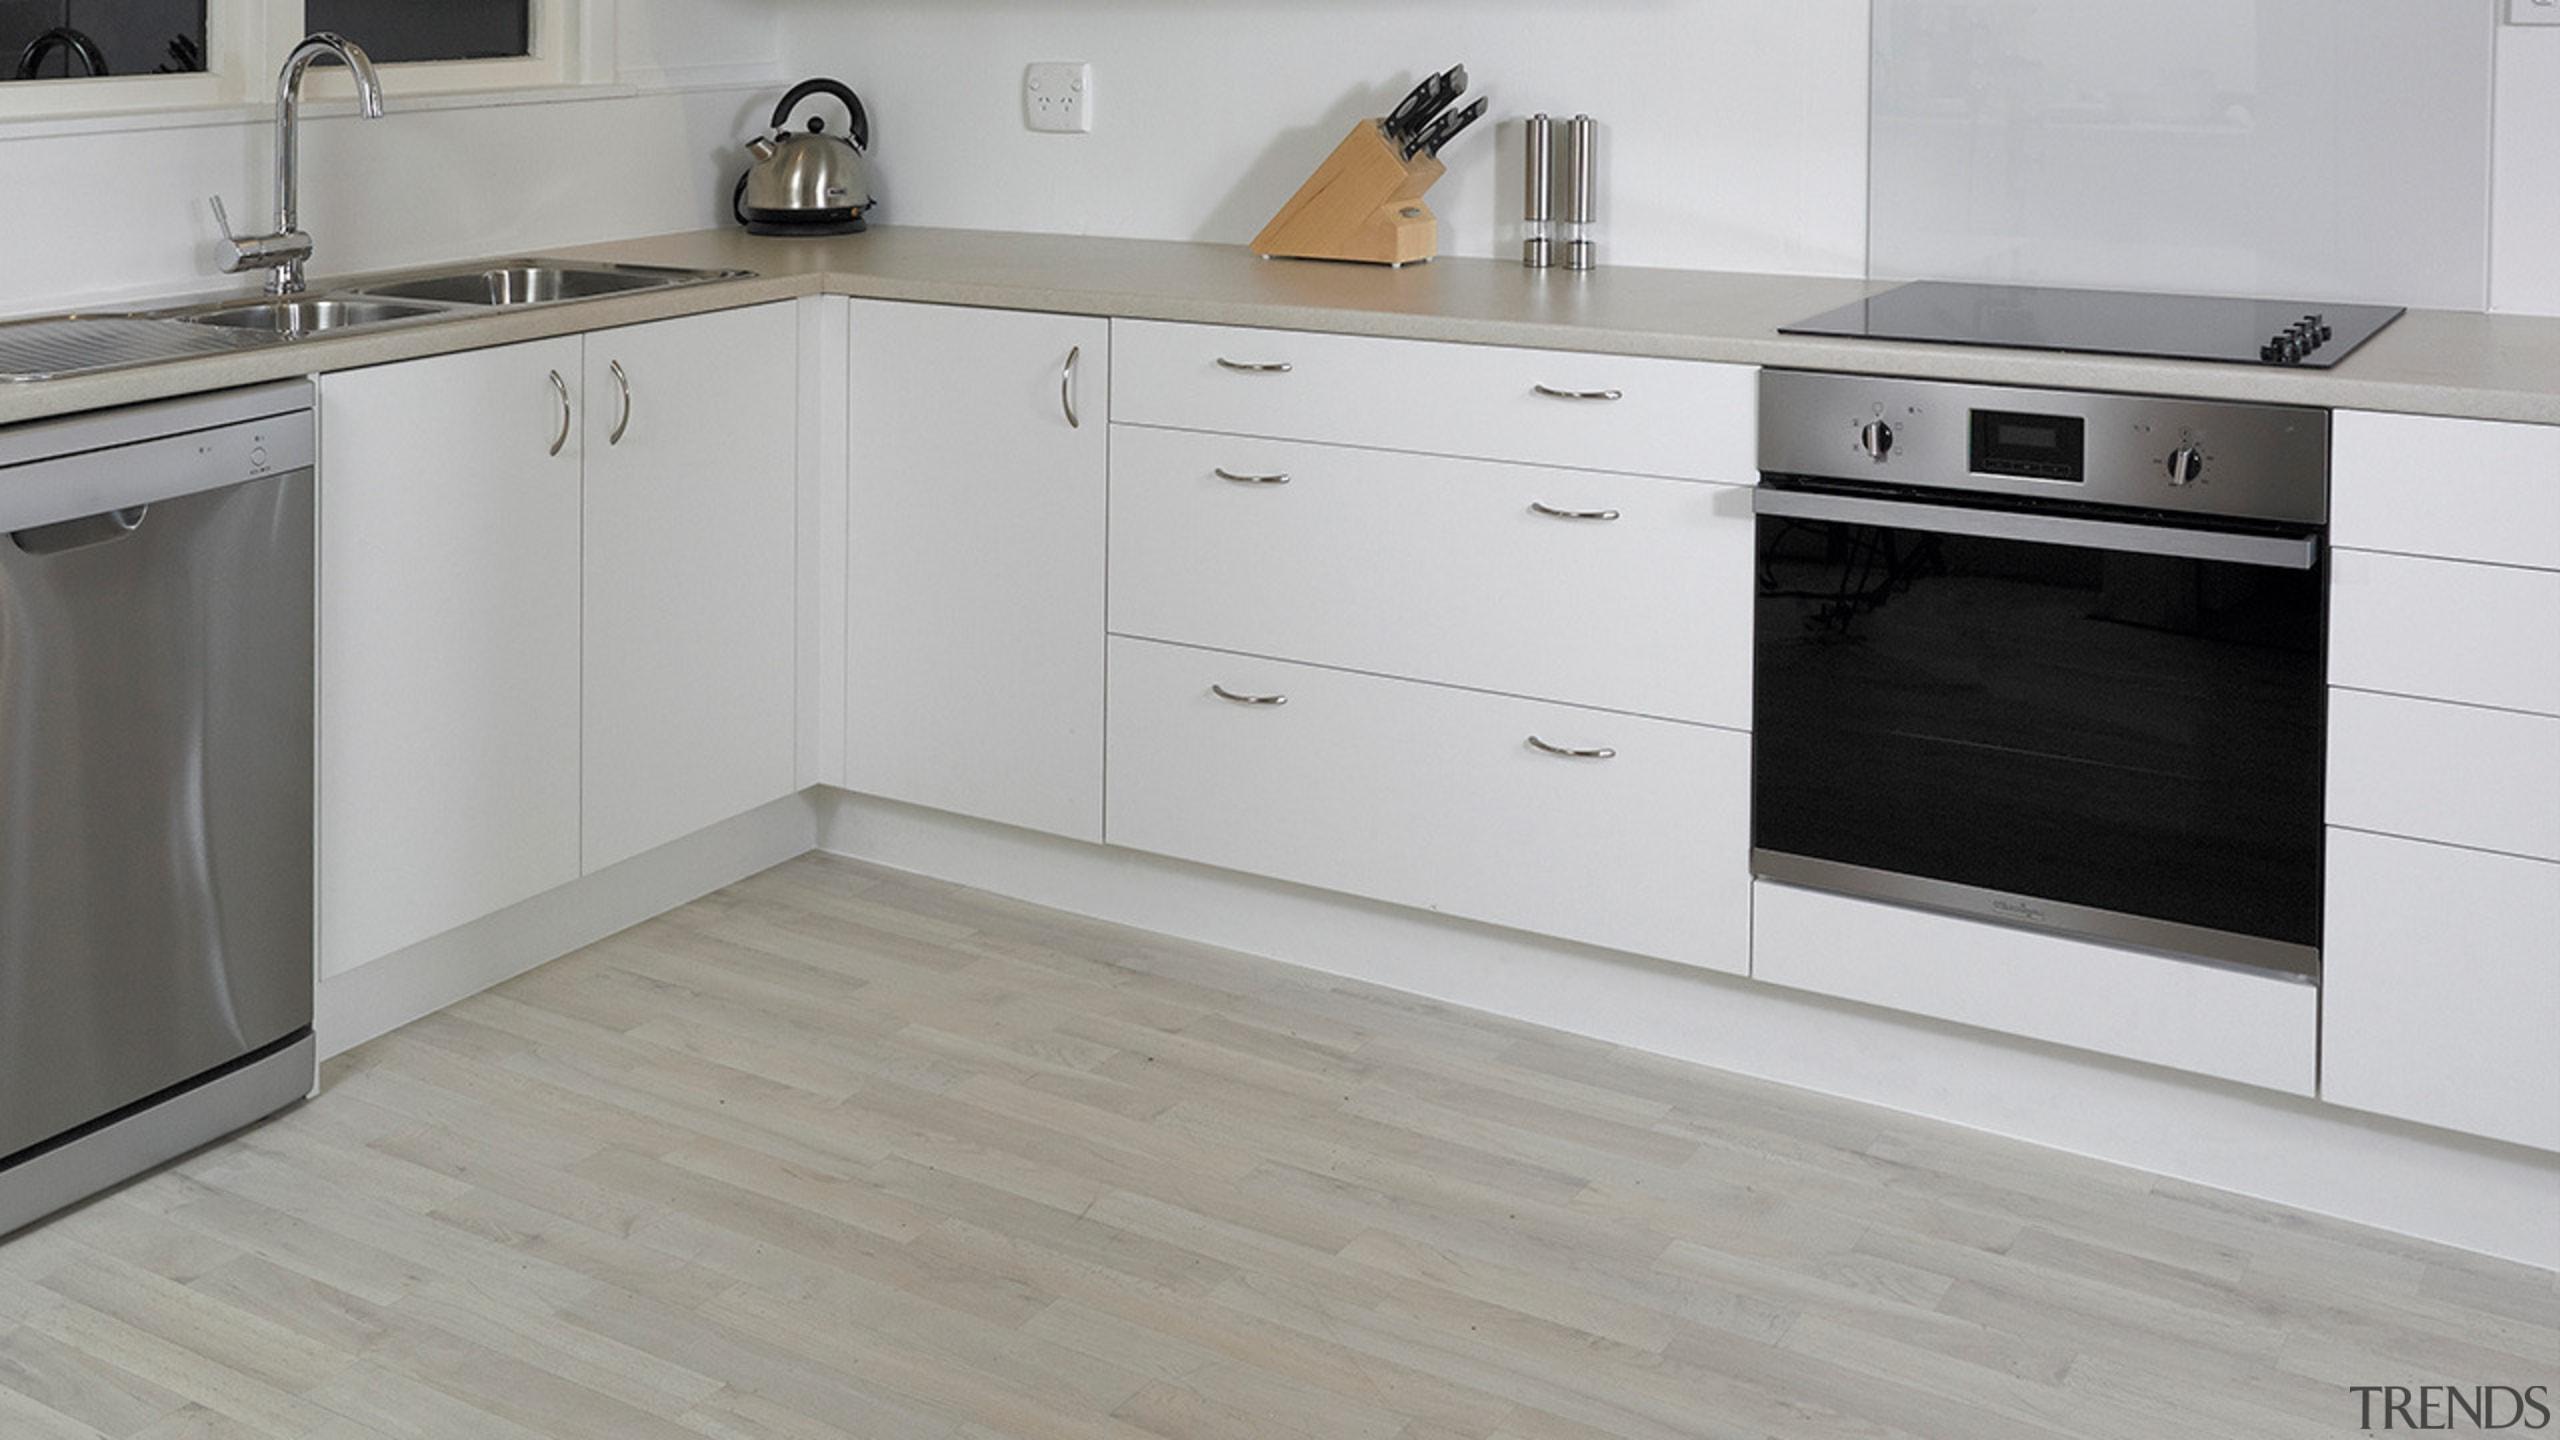 See more here cabinetry, countertop, cuisine classique, floor, flooring, furniture, hardwood, kitchen, laminate flooring, product, tile, wood, wood flooring, gray